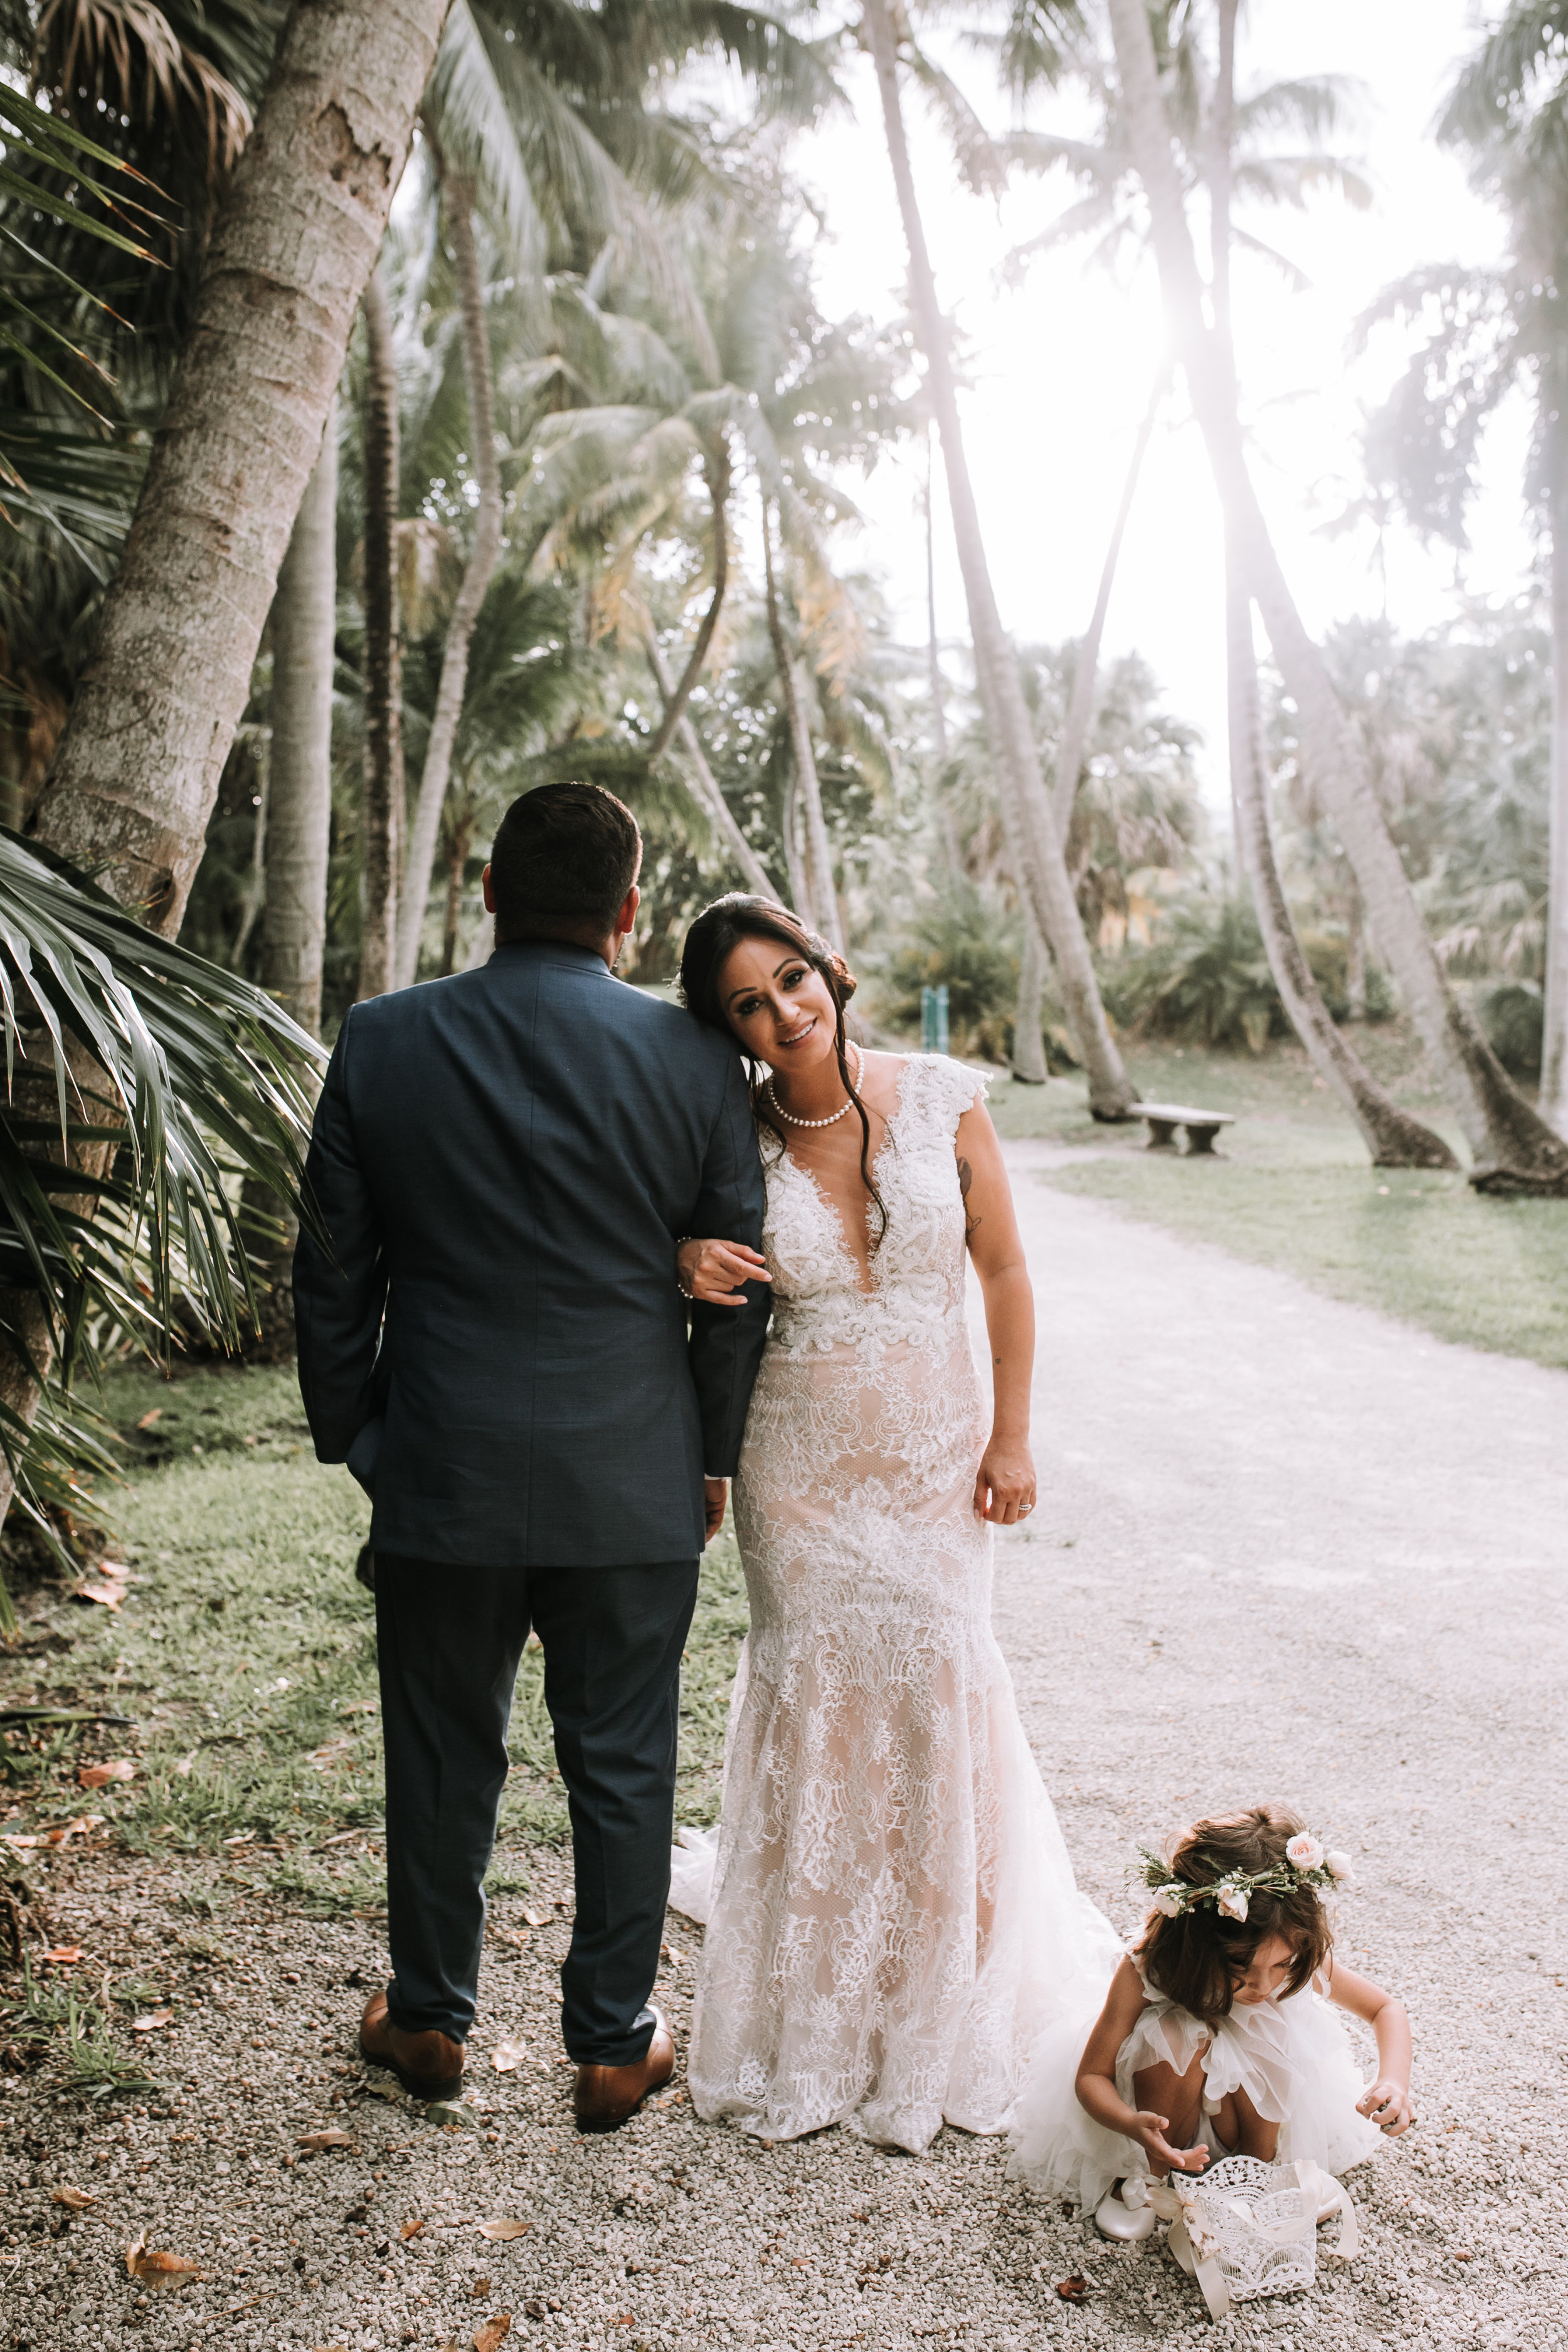 Bonett-House-wedding-fort-lauderdale-florida-Rkm-Photography-251.jpg